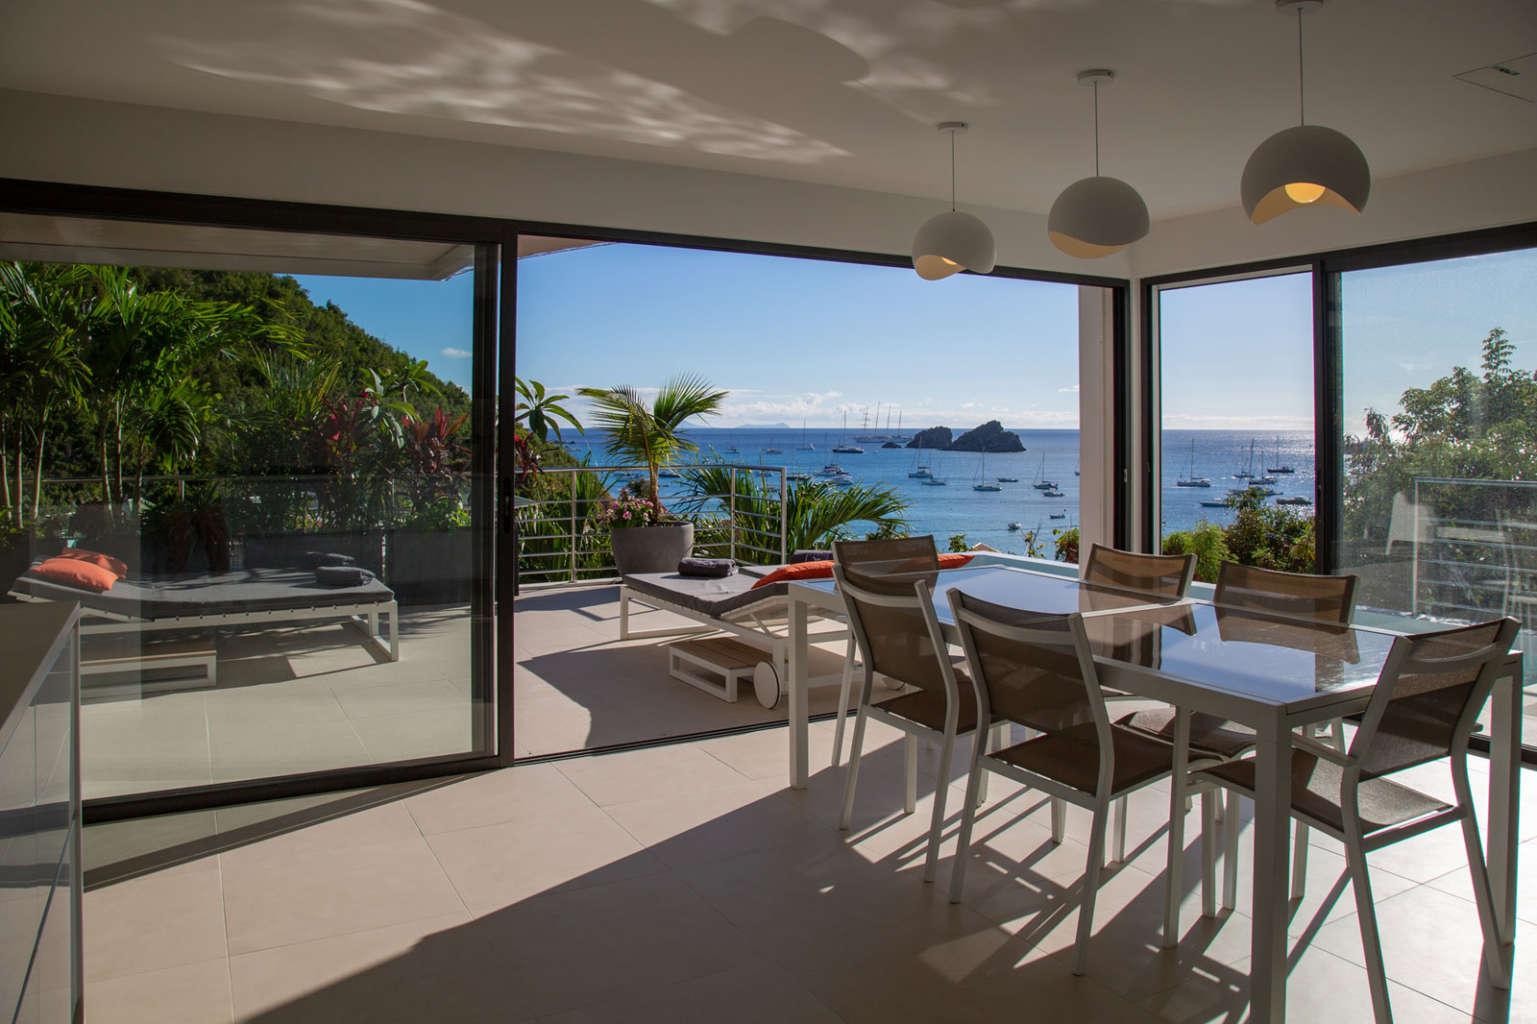 Villa Aka - 3 Bedroom Villa for Rent St Barth Corossol with an Amazing View - Patio